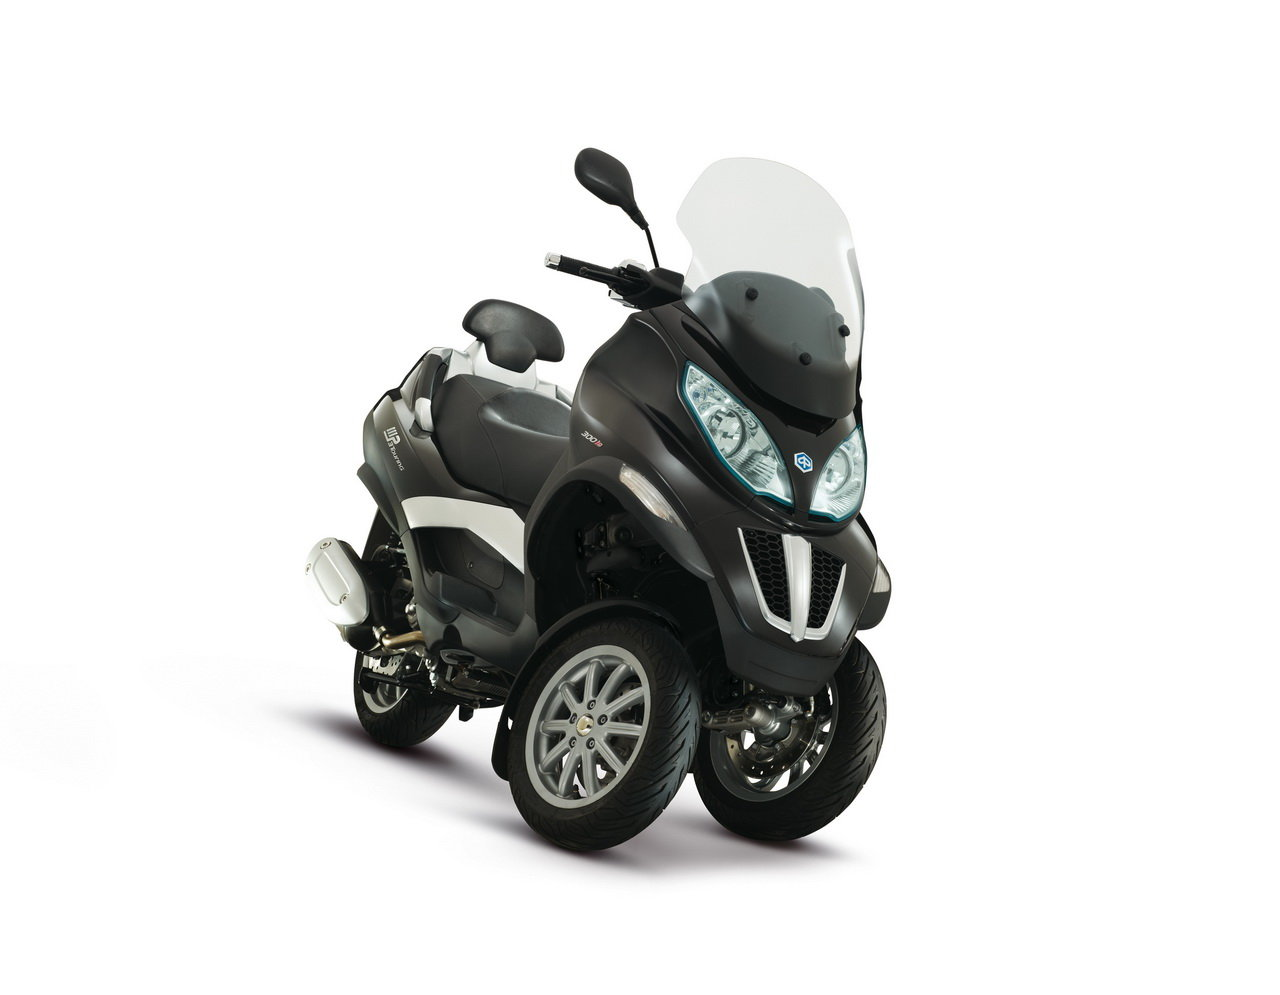 Listino Piaggio Liberty 50 2T Teens Scooter 50 - image 15100_piaggio-mp3300-ie-touring-lt on http://moto.motori.net